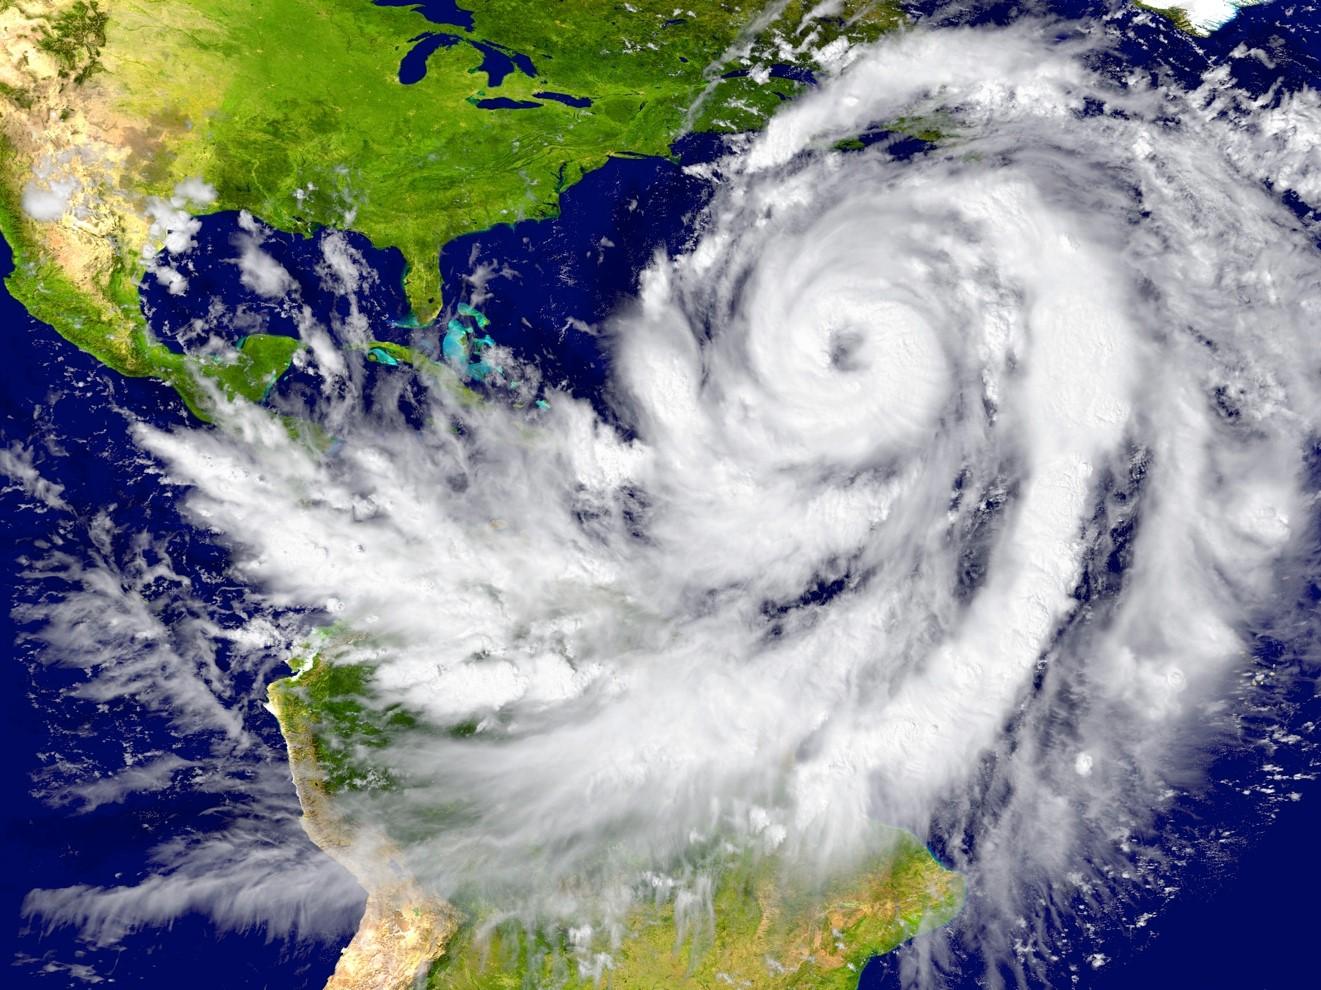 Hurricane Season Cruising- What You Need to Know